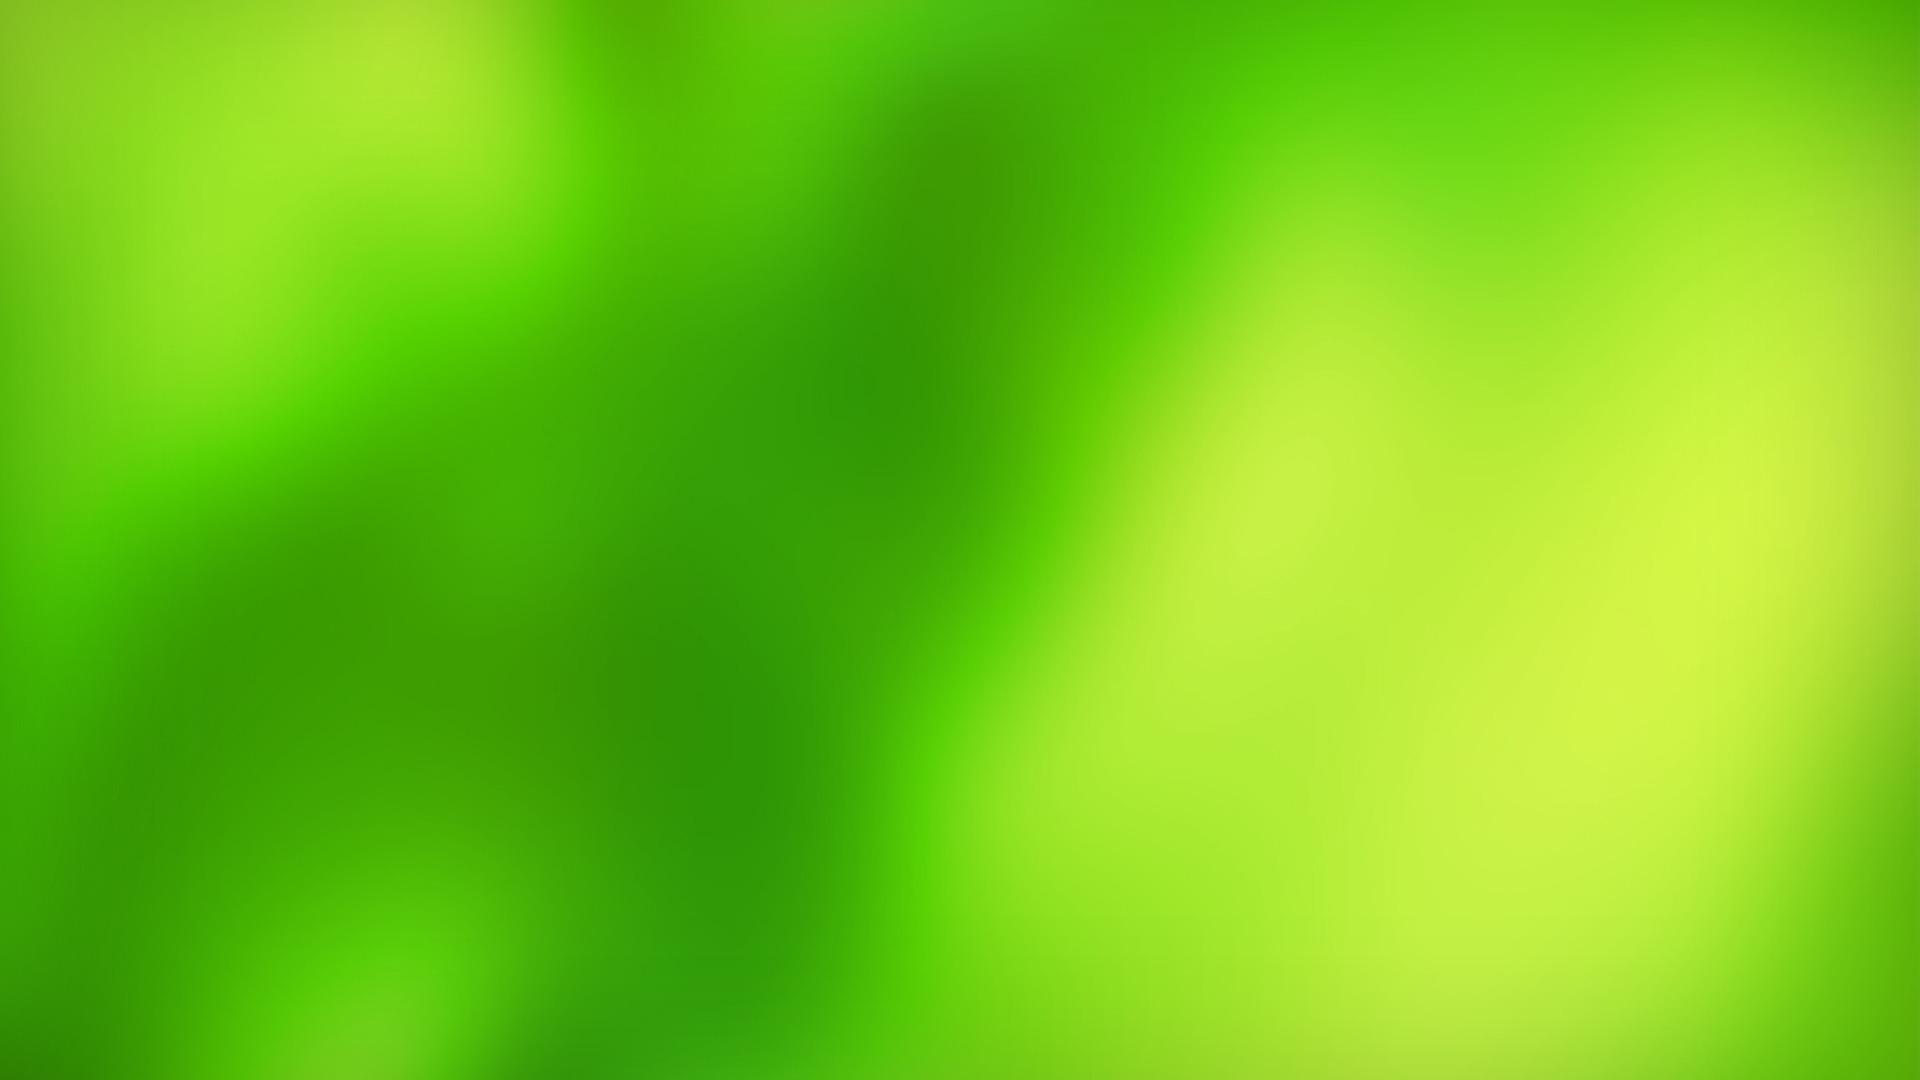 green 27783